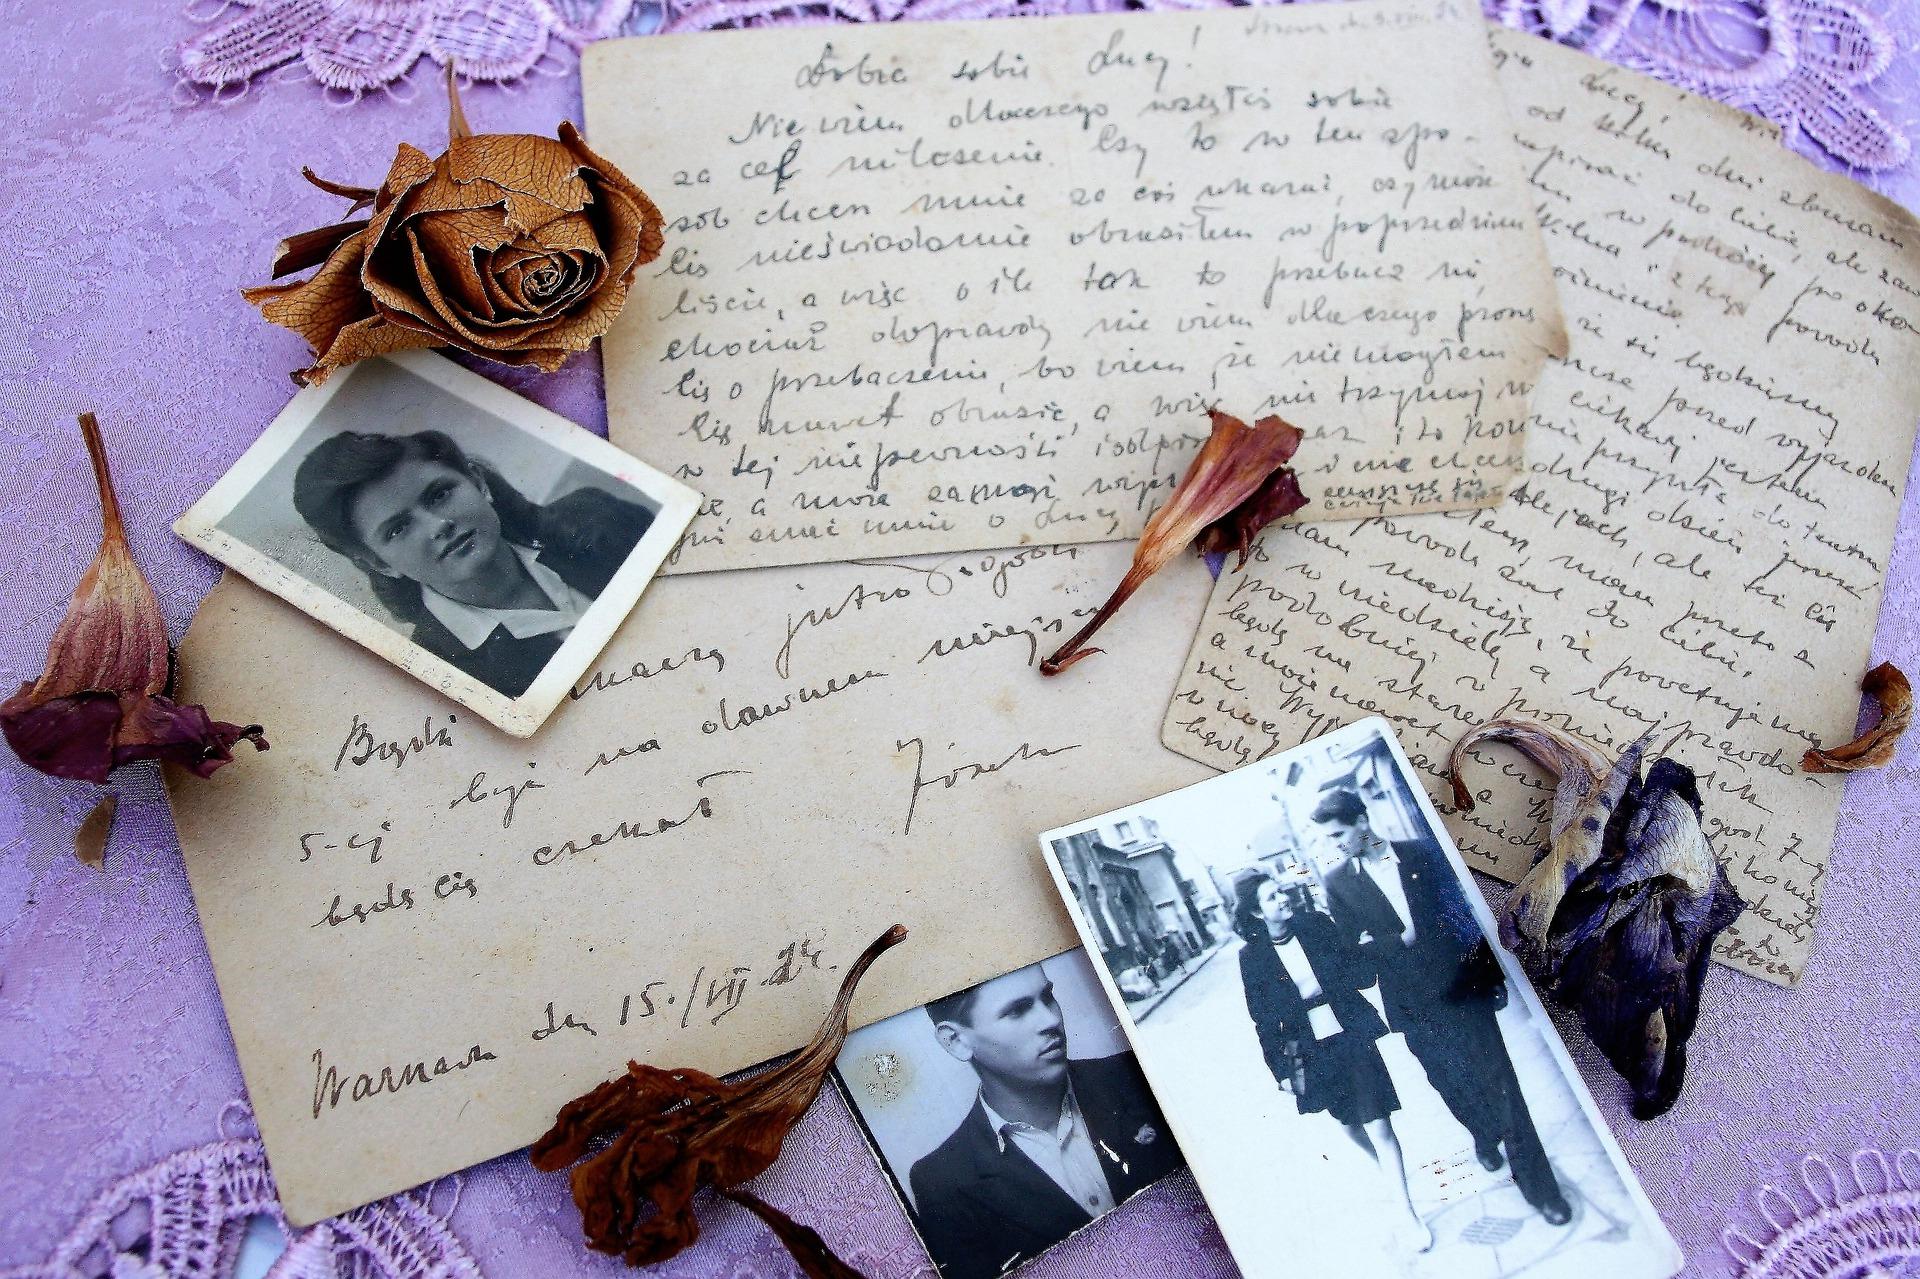 old-letter-3054262_1920.jpg